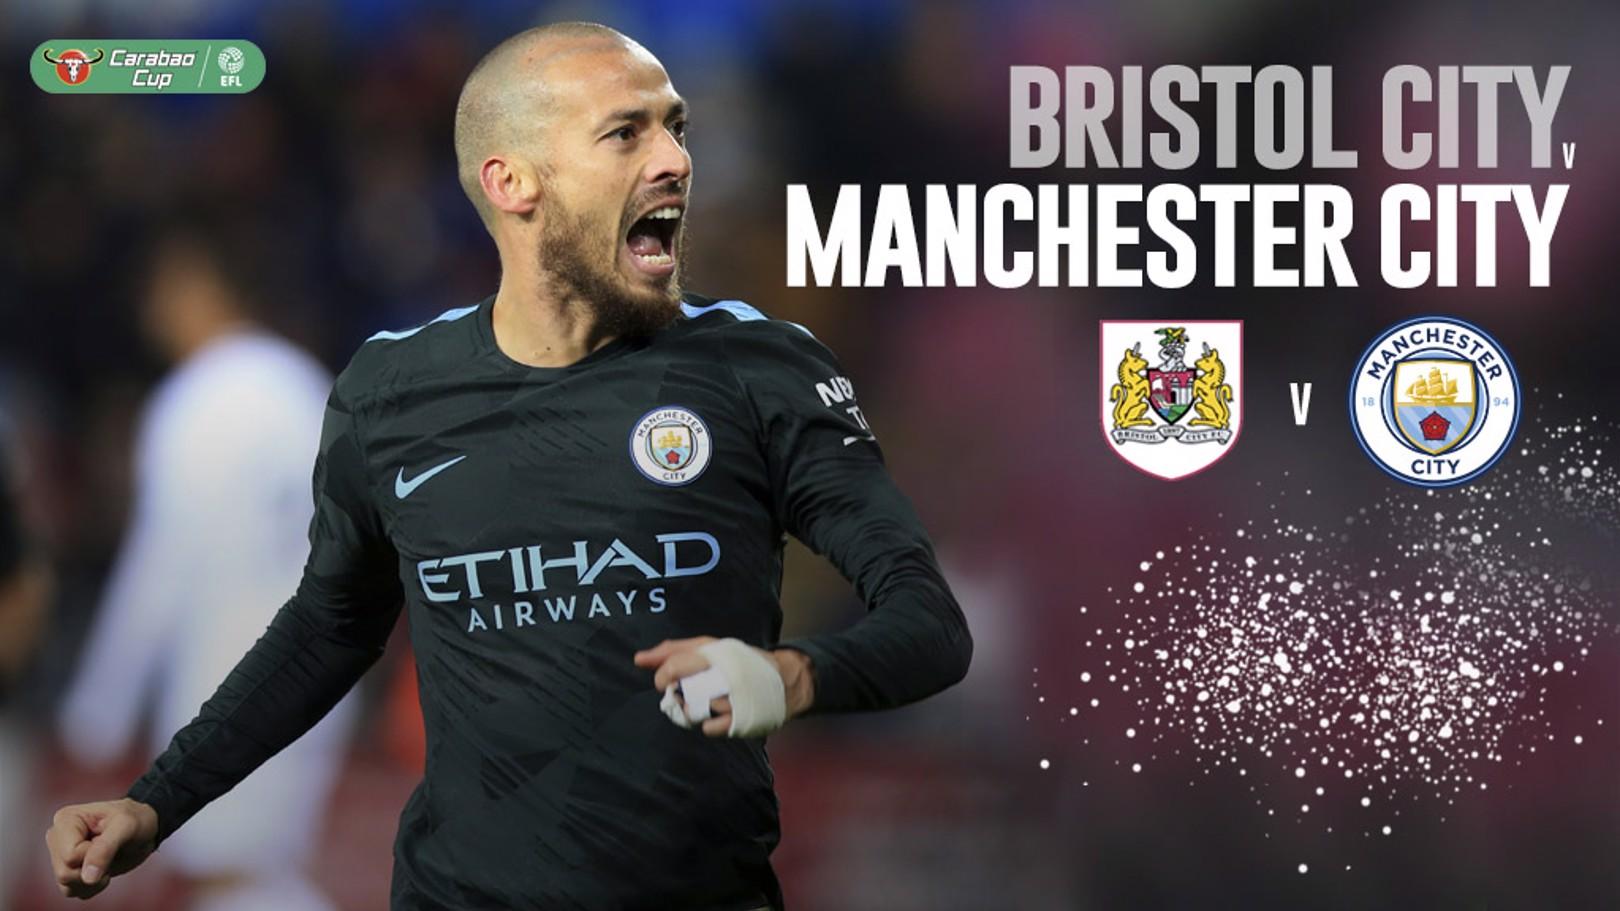 Bristol City - Manchester City.